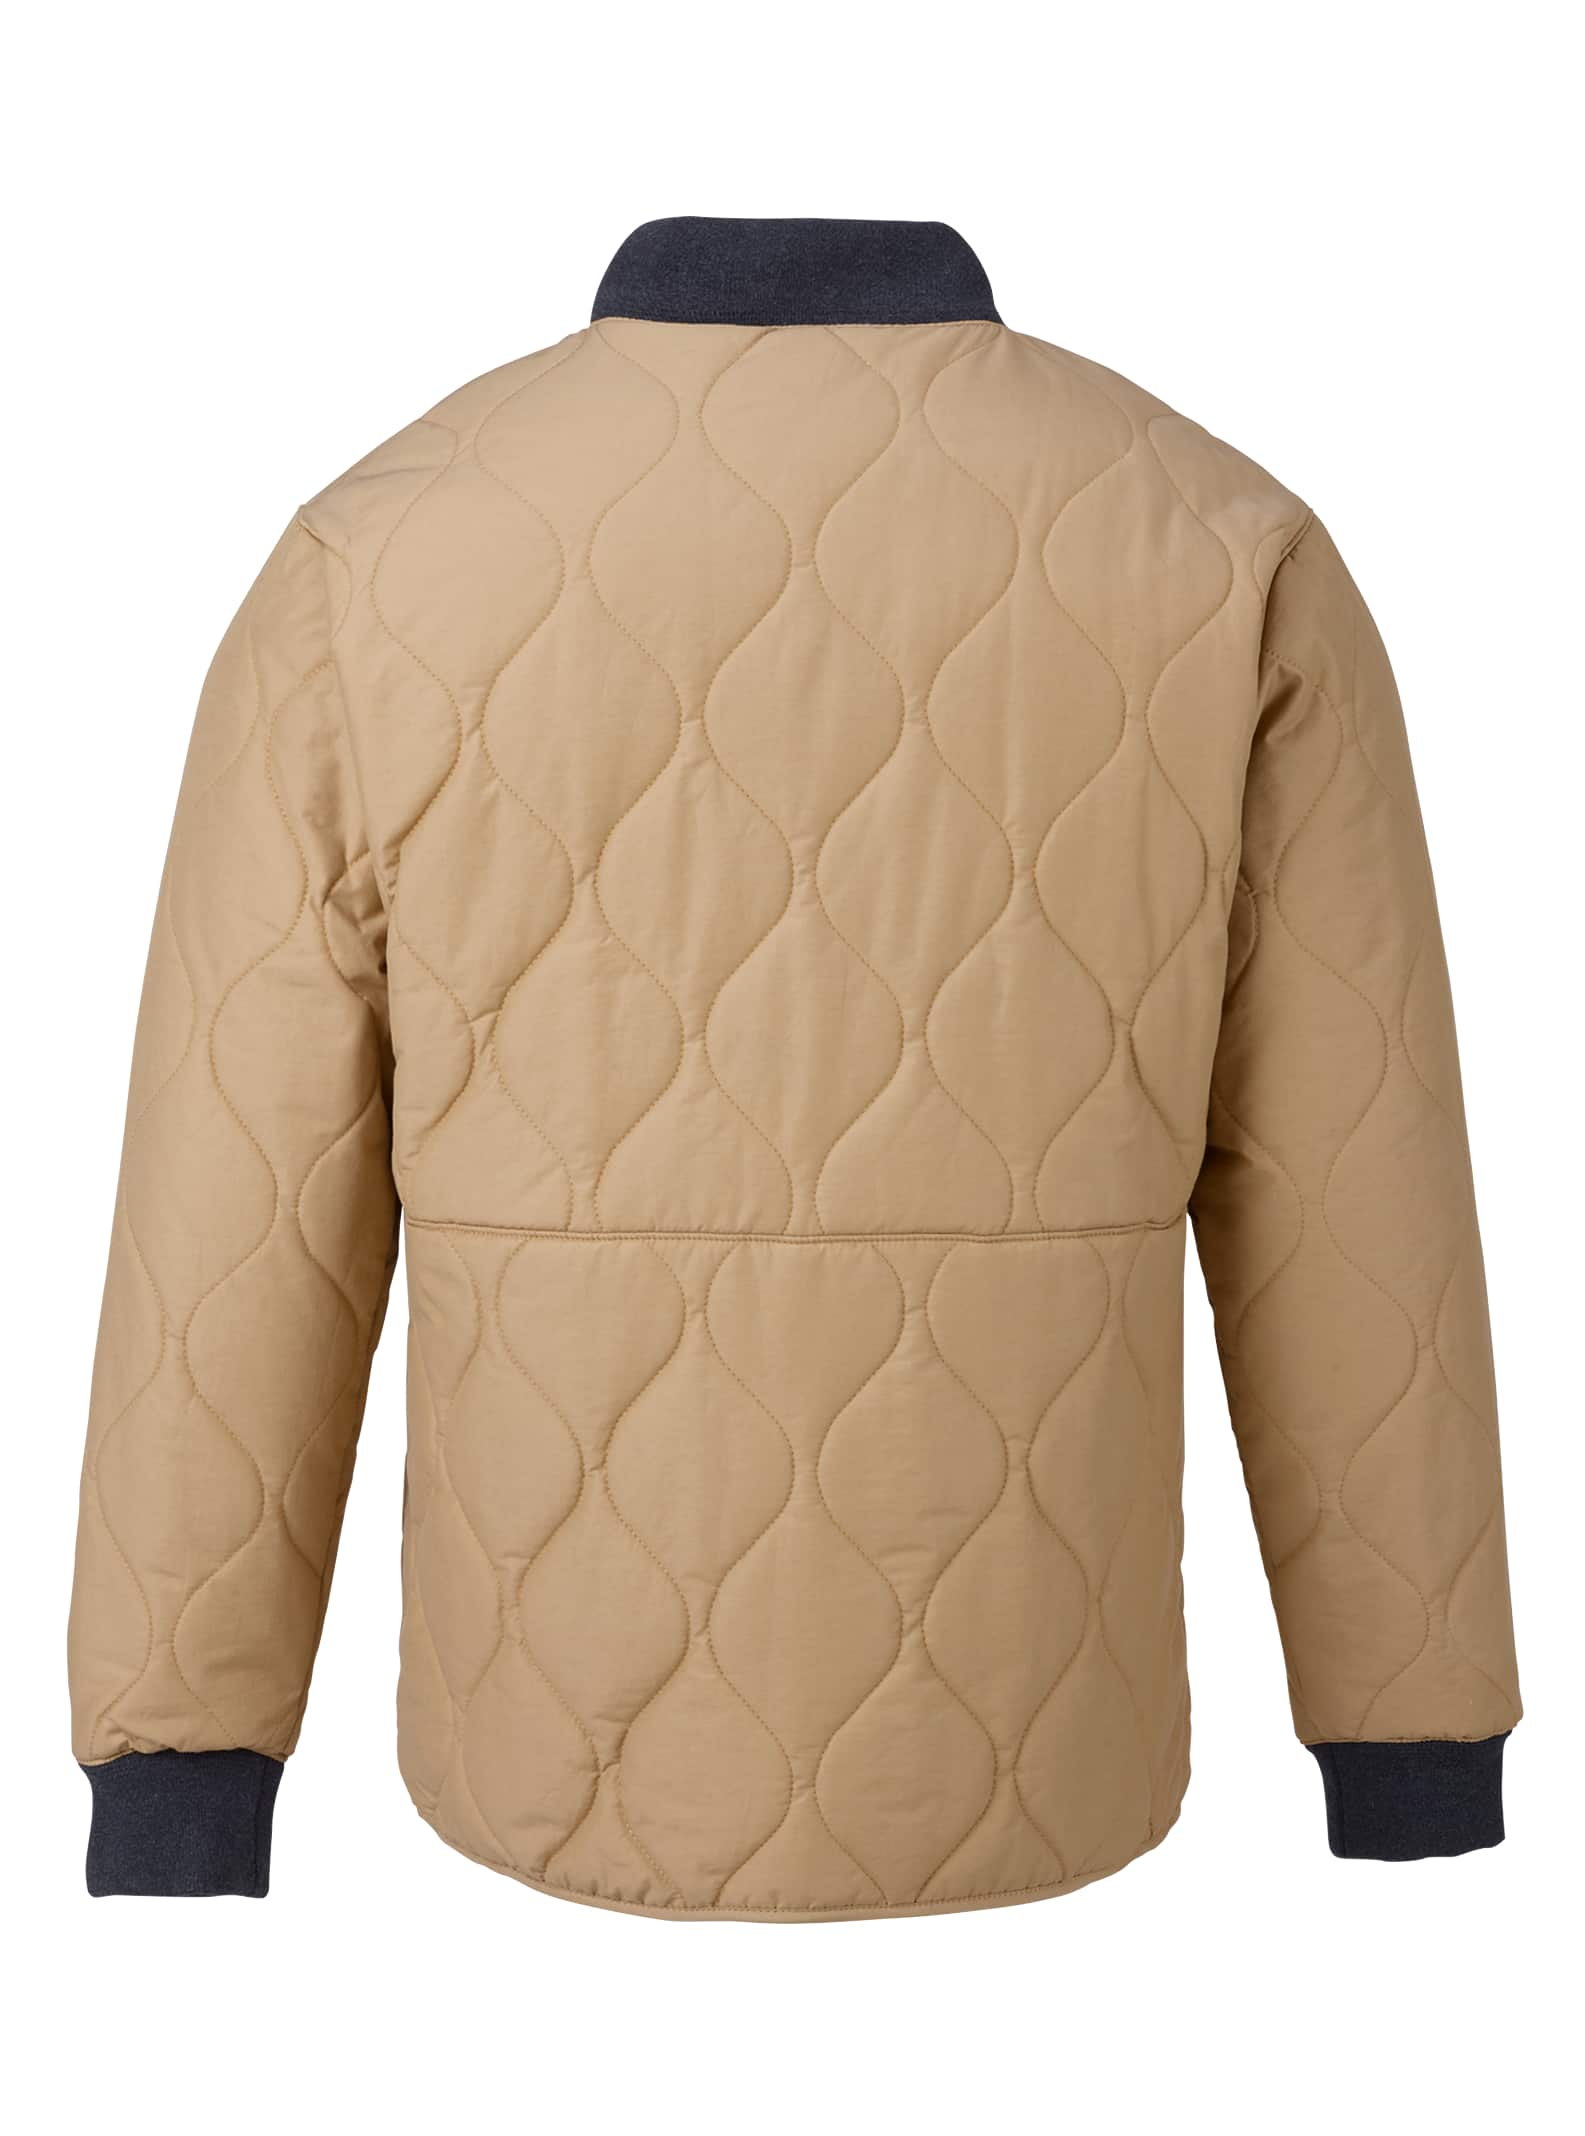 Men's Burton Mallett Bomber Jacket